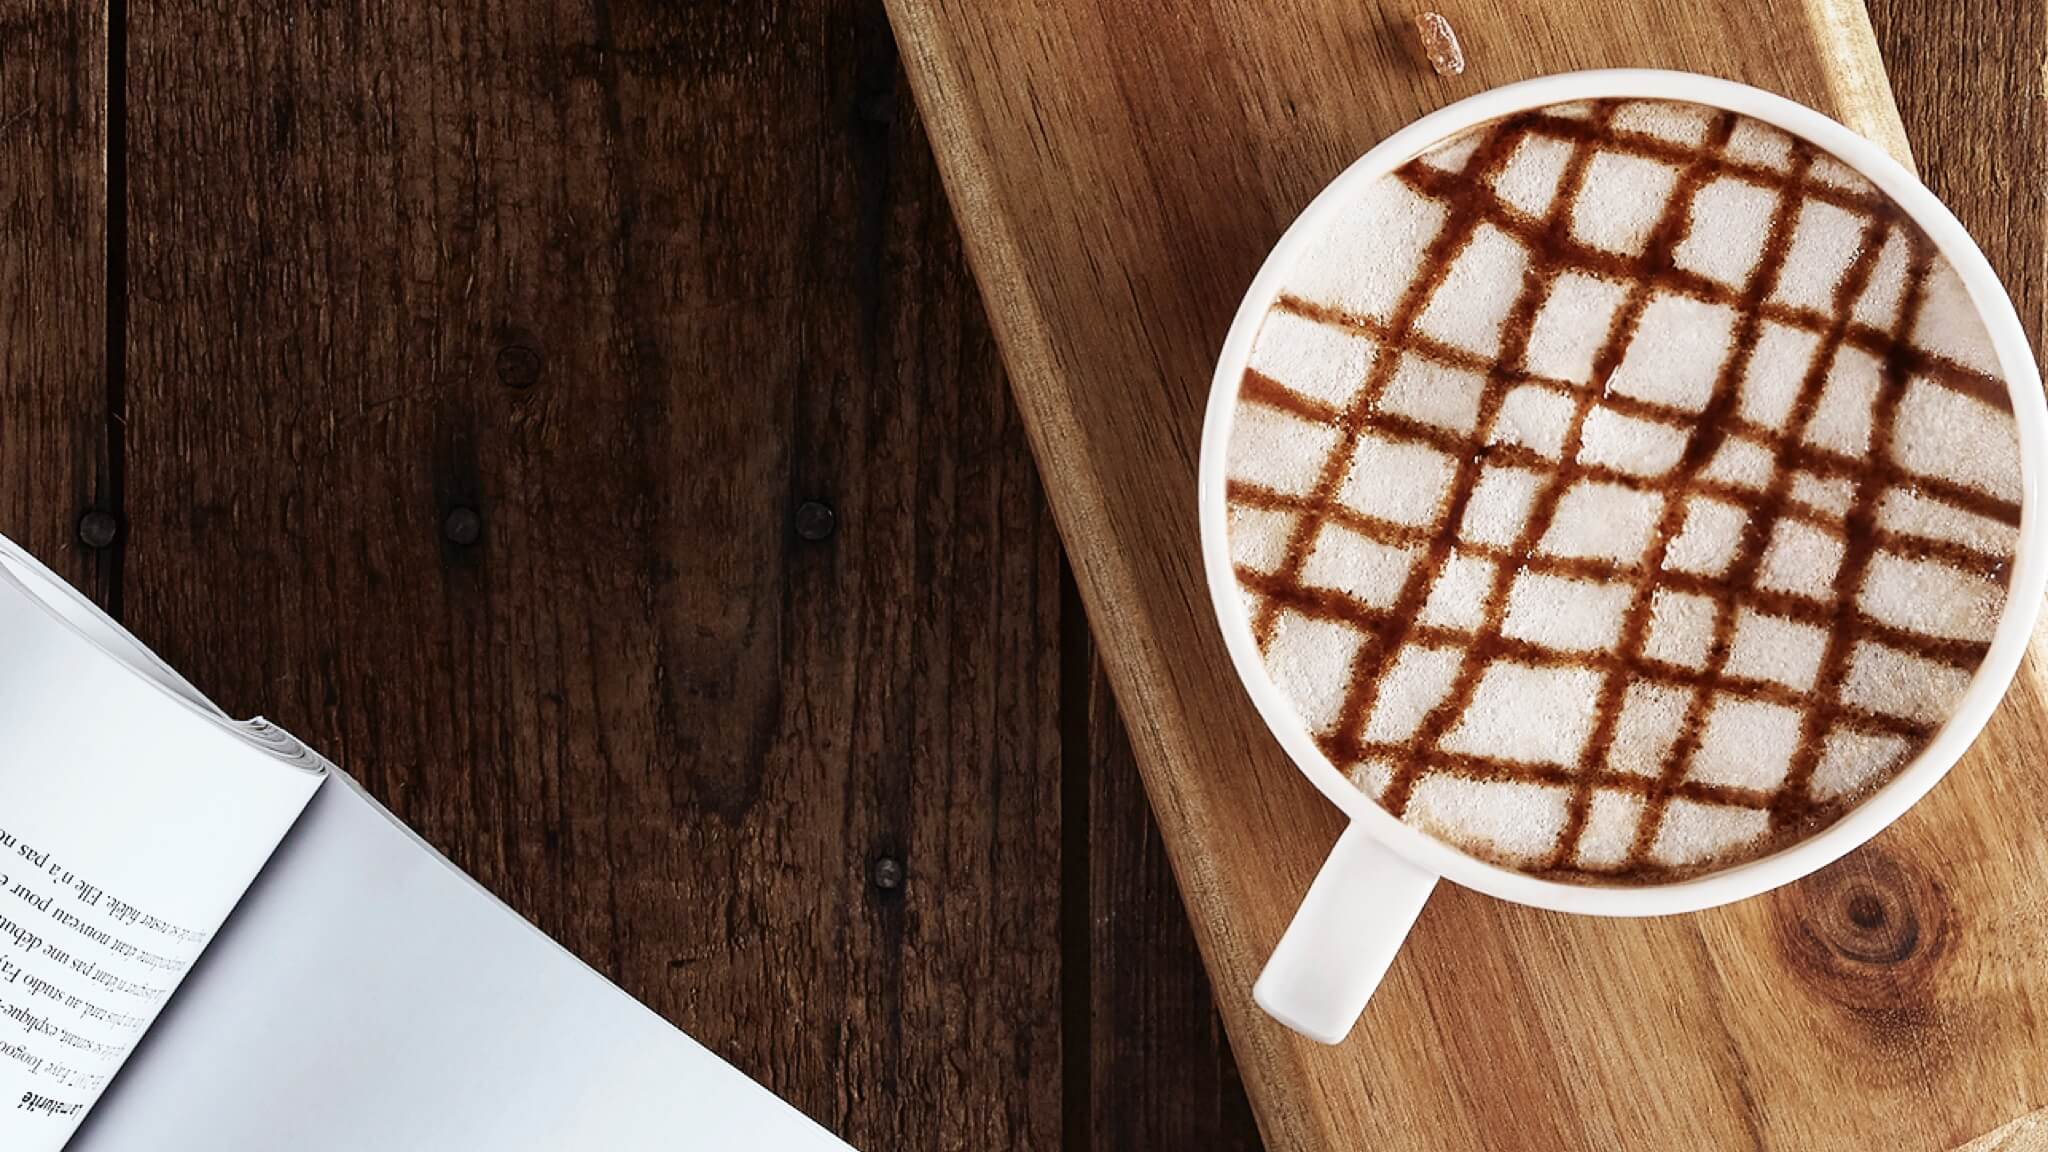 I like my coffee frothy & milky